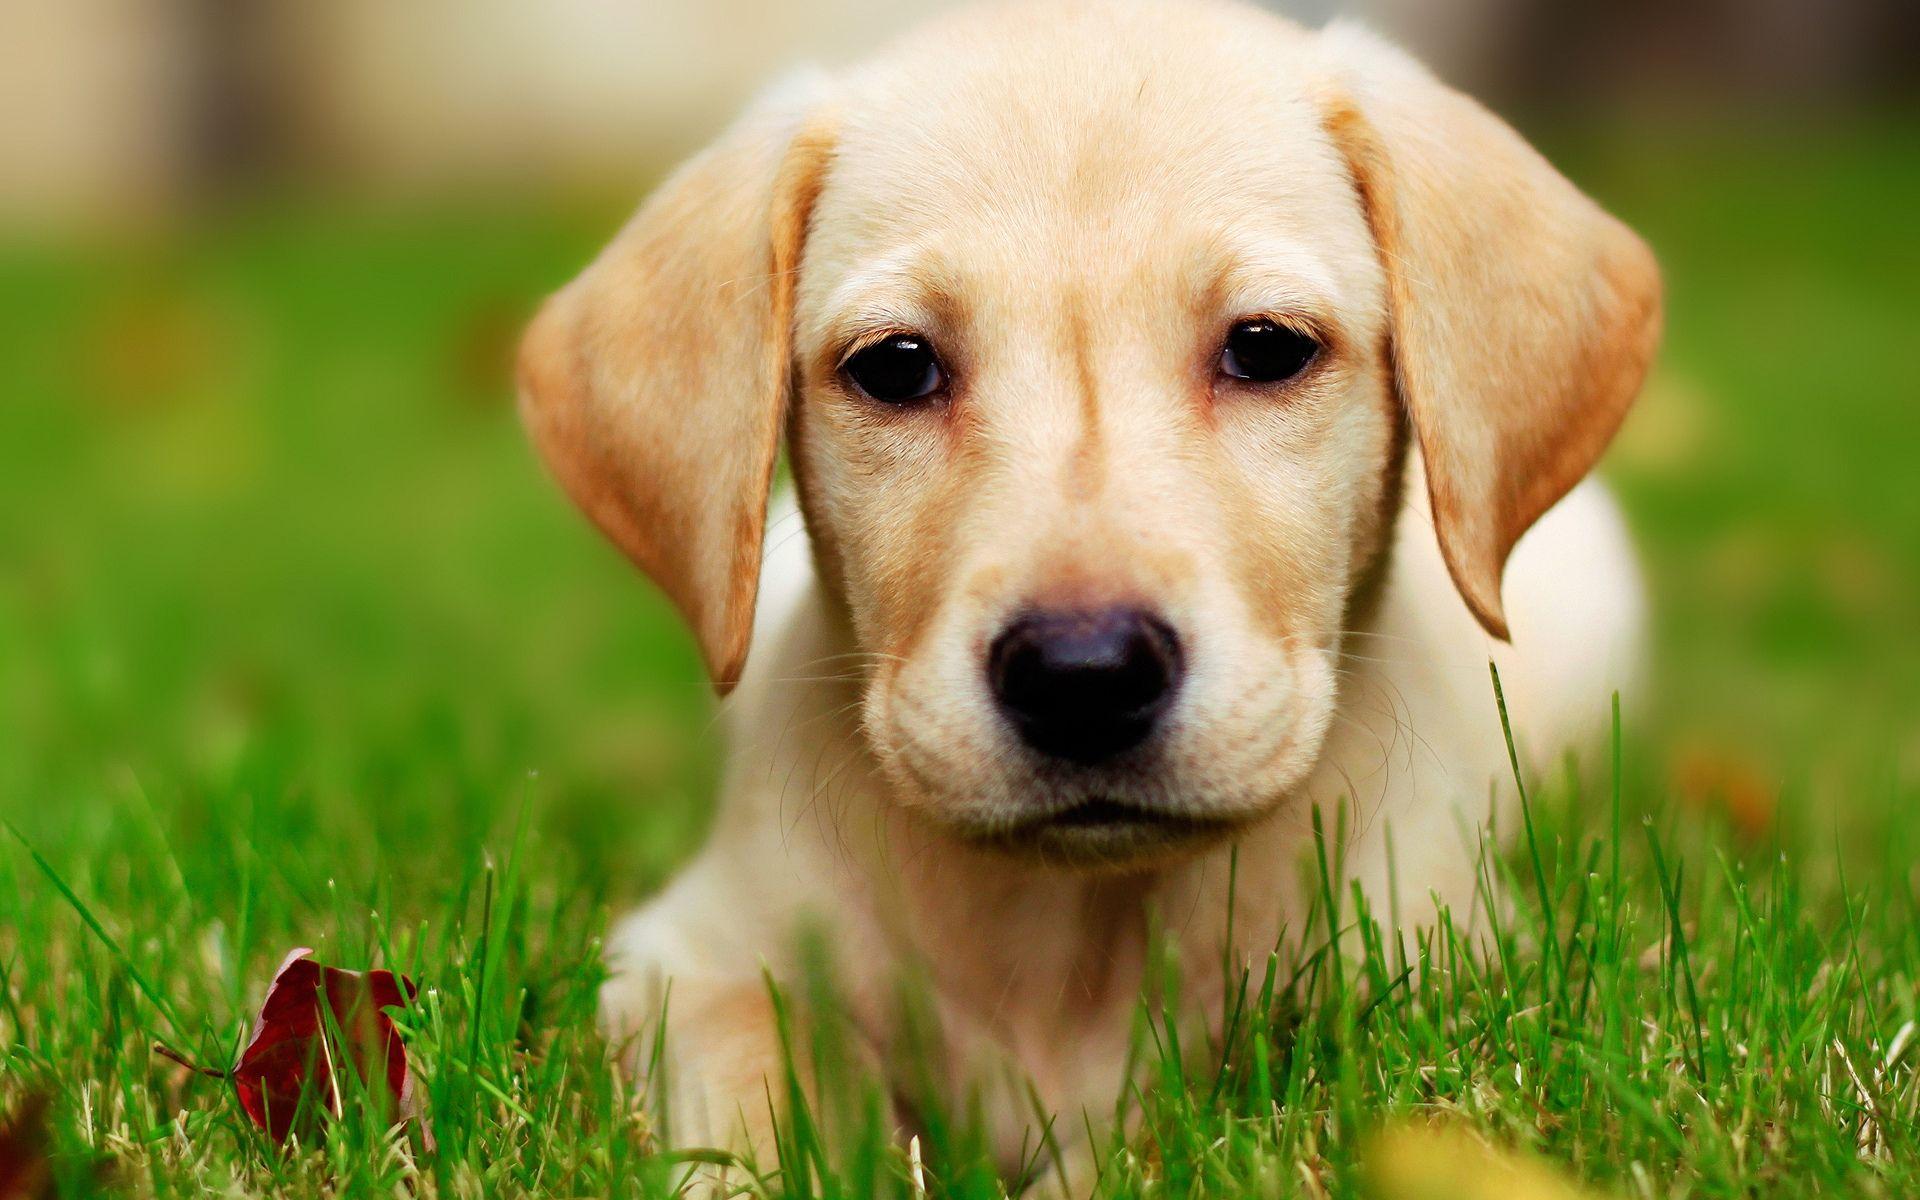 cute dog picture wallpaper